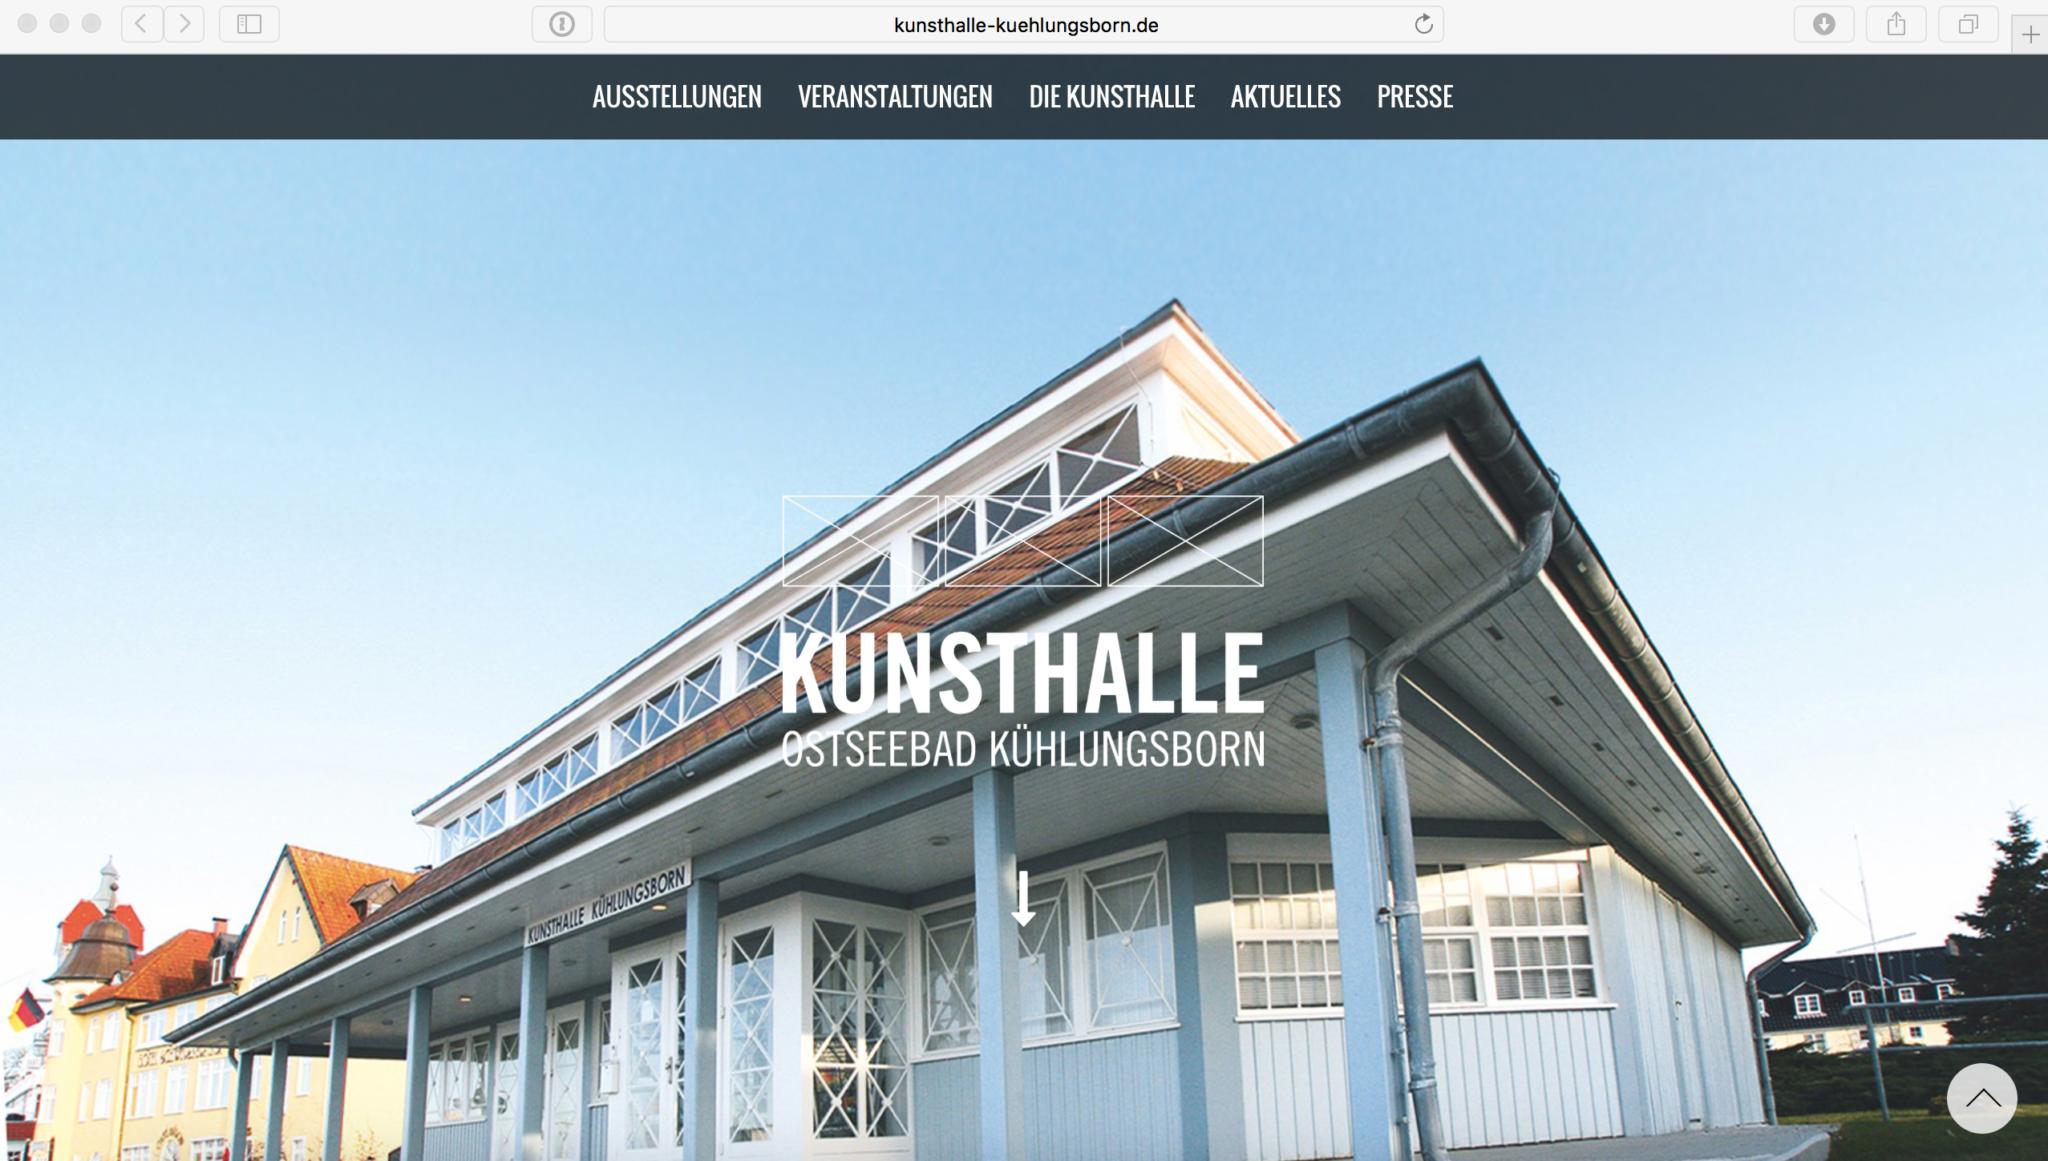 www.kunsthalle-kuehlungsborn.de-2